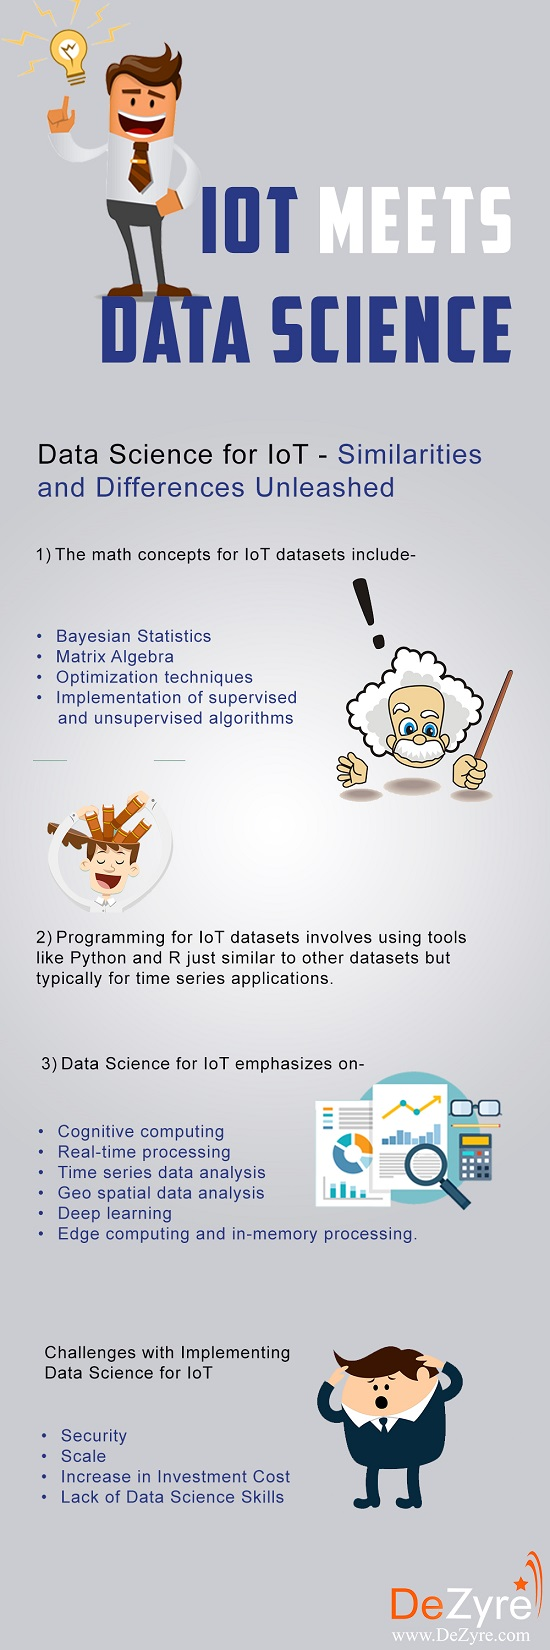 Big Data IoT Data Science